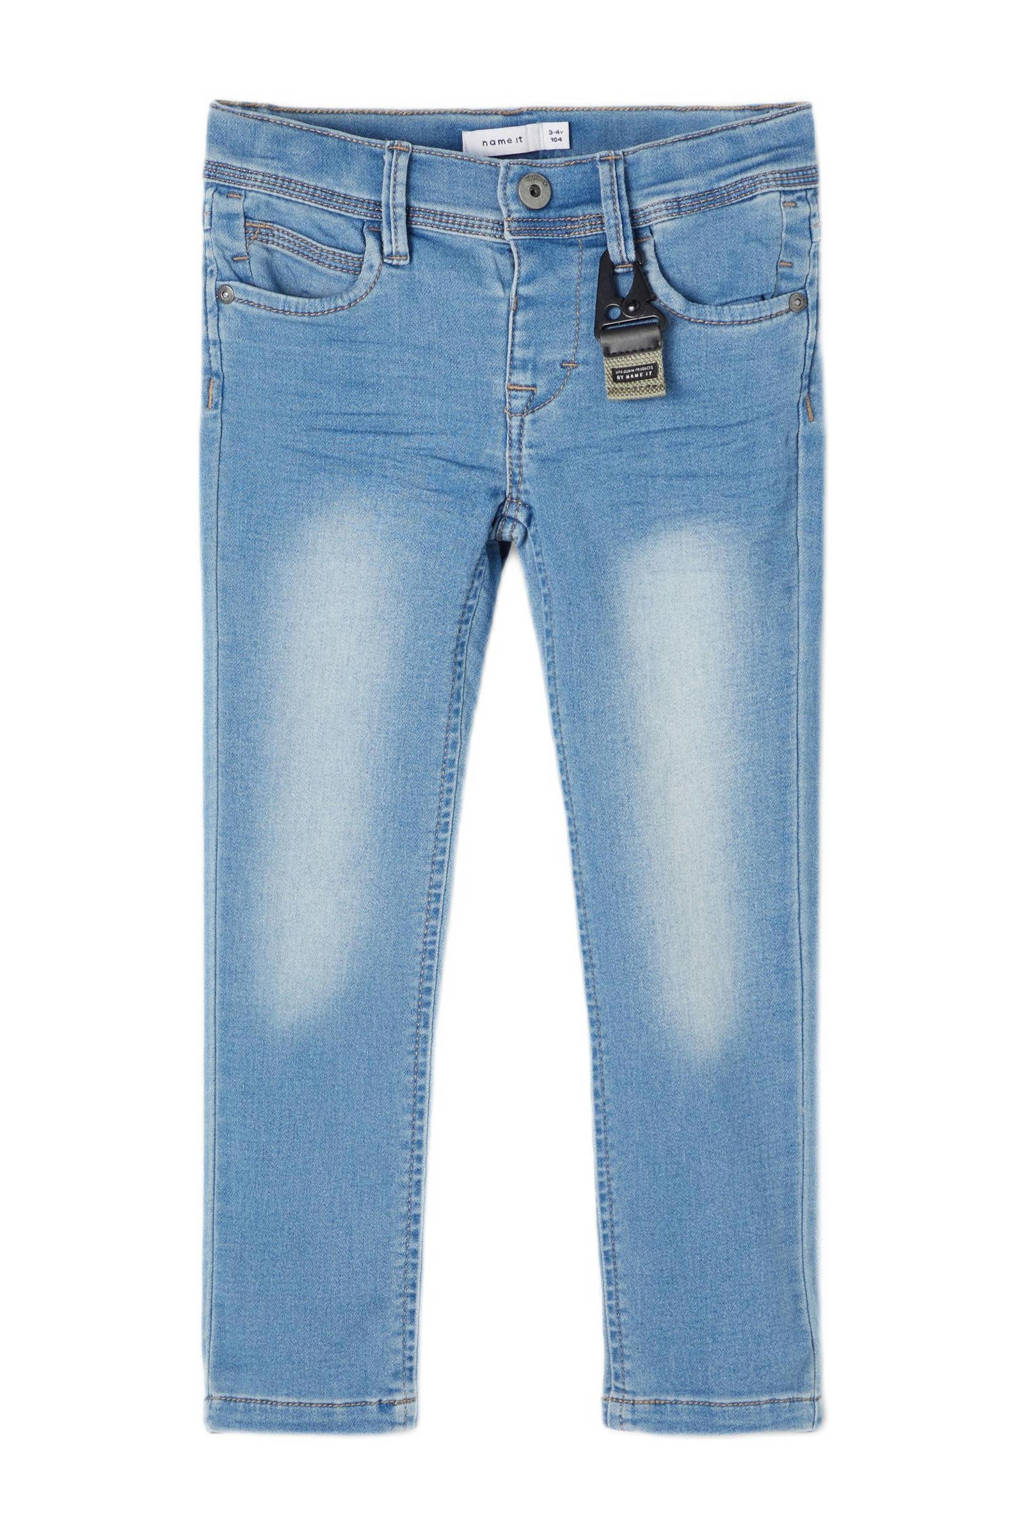 NAME IT MINI slim fit jeans NMMSOFUS light blue denim, Light blue denim